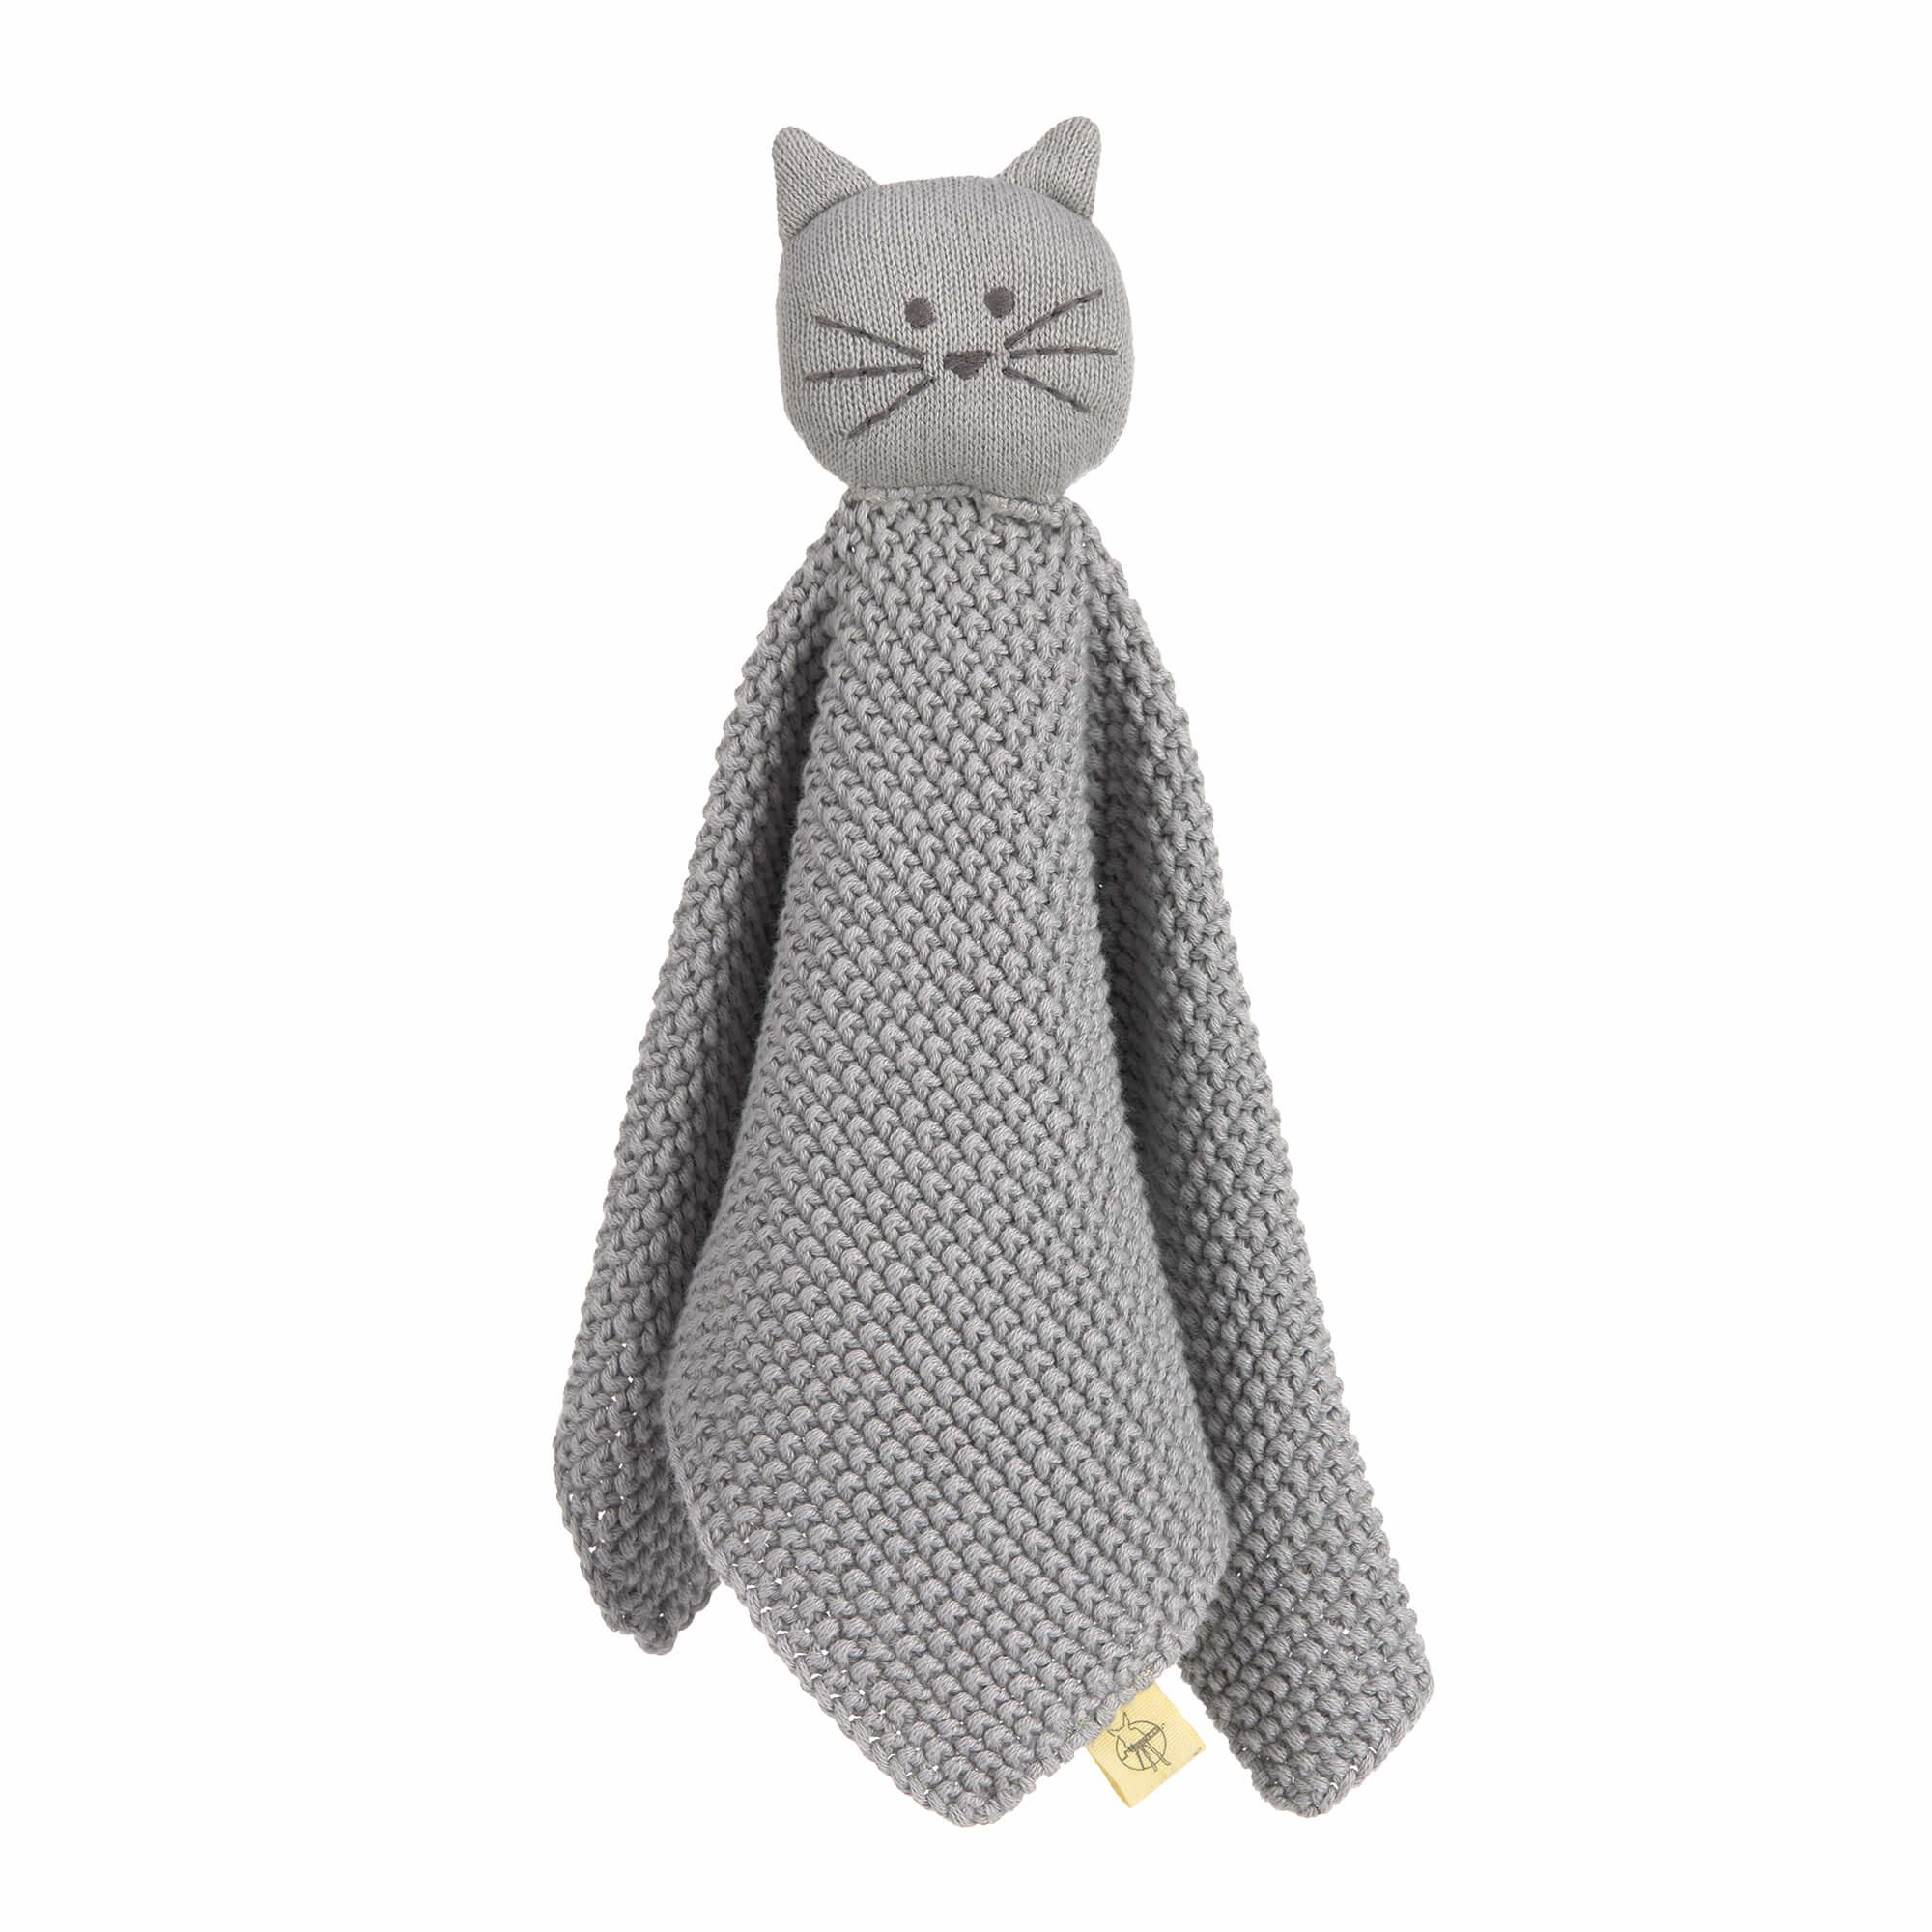 Lässig gebreide baby knuffel 100% organic cotton, Little Chums cat